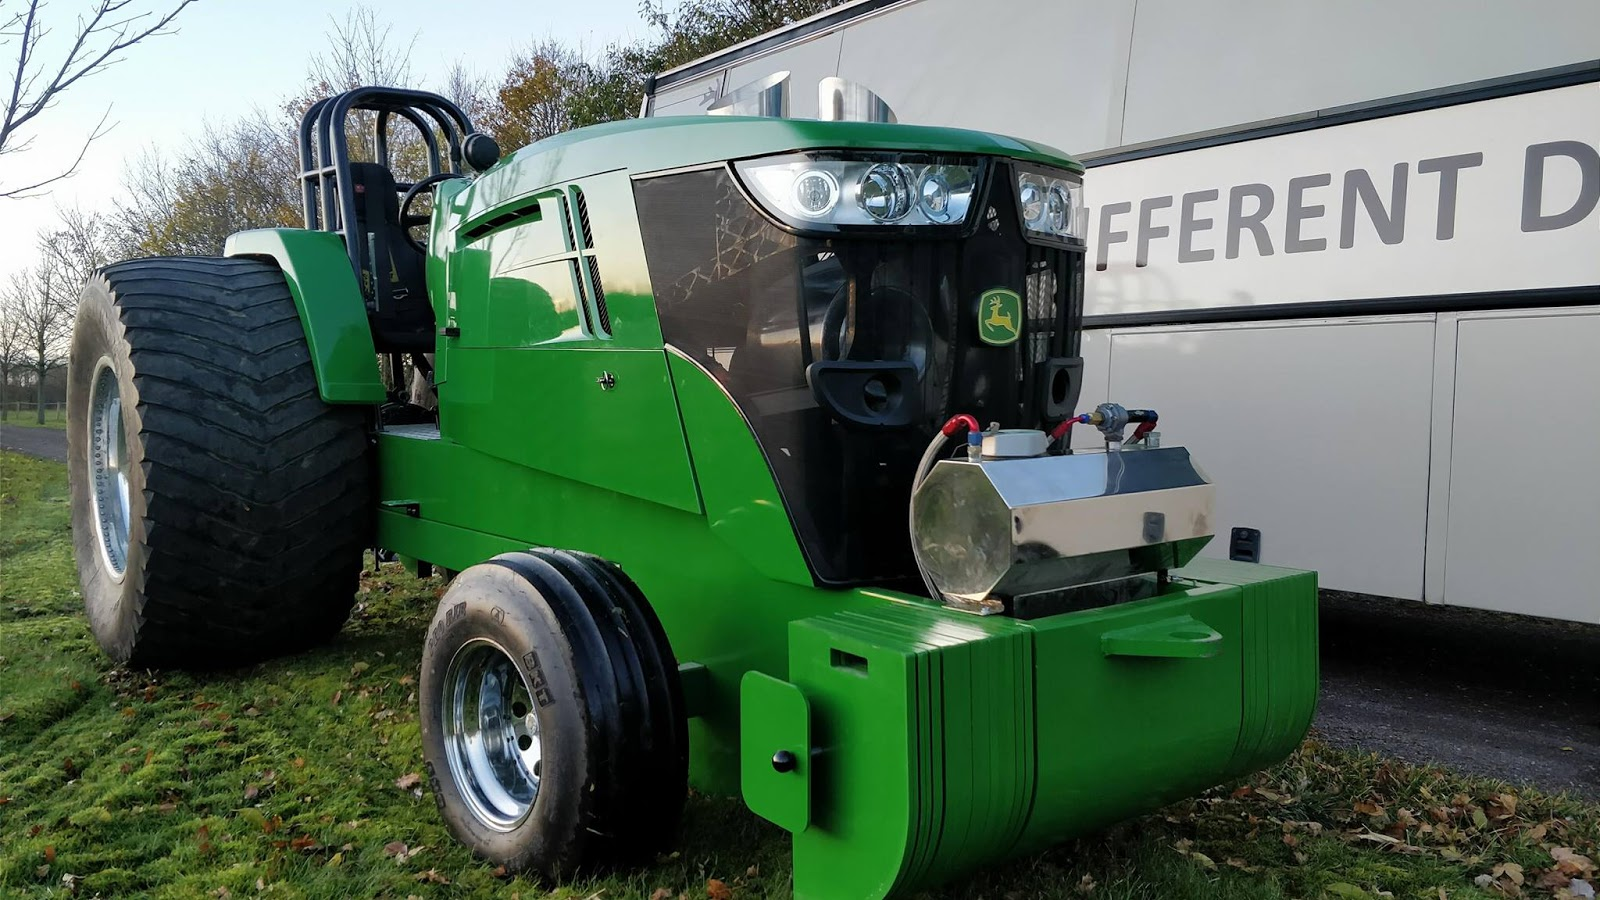 John Deere Super Stock Pulling Tractors : Tractor pulling news pullingworld the new